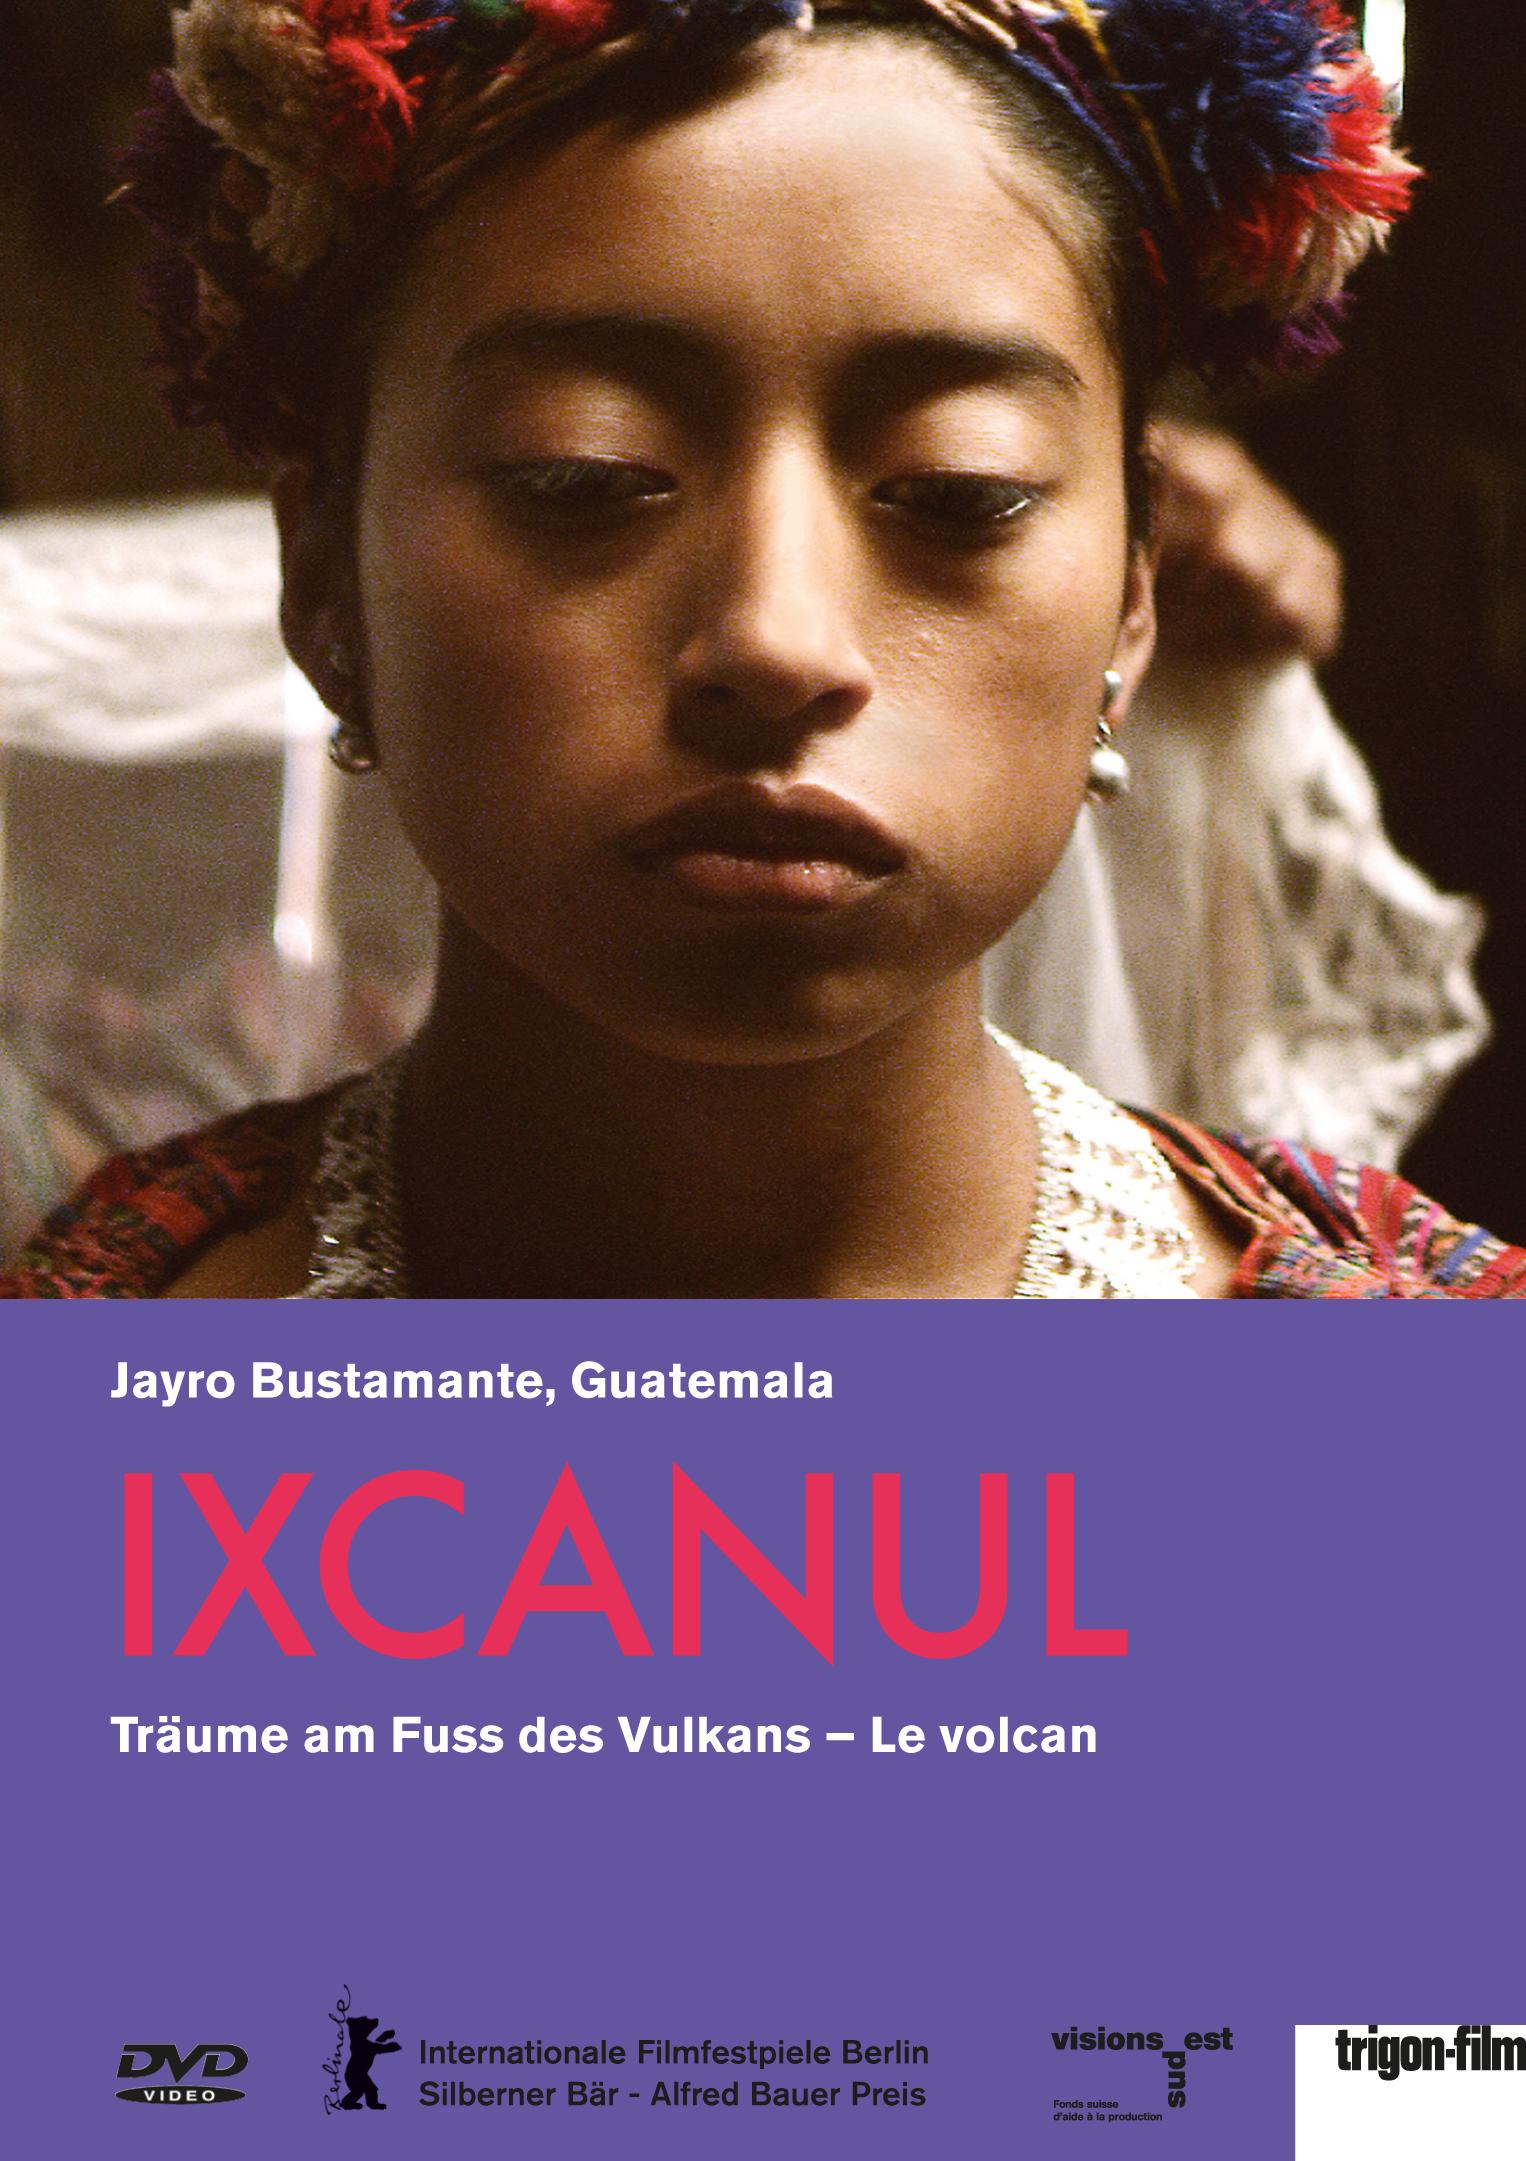 Ixcanul (DVD) – trigon-film.org